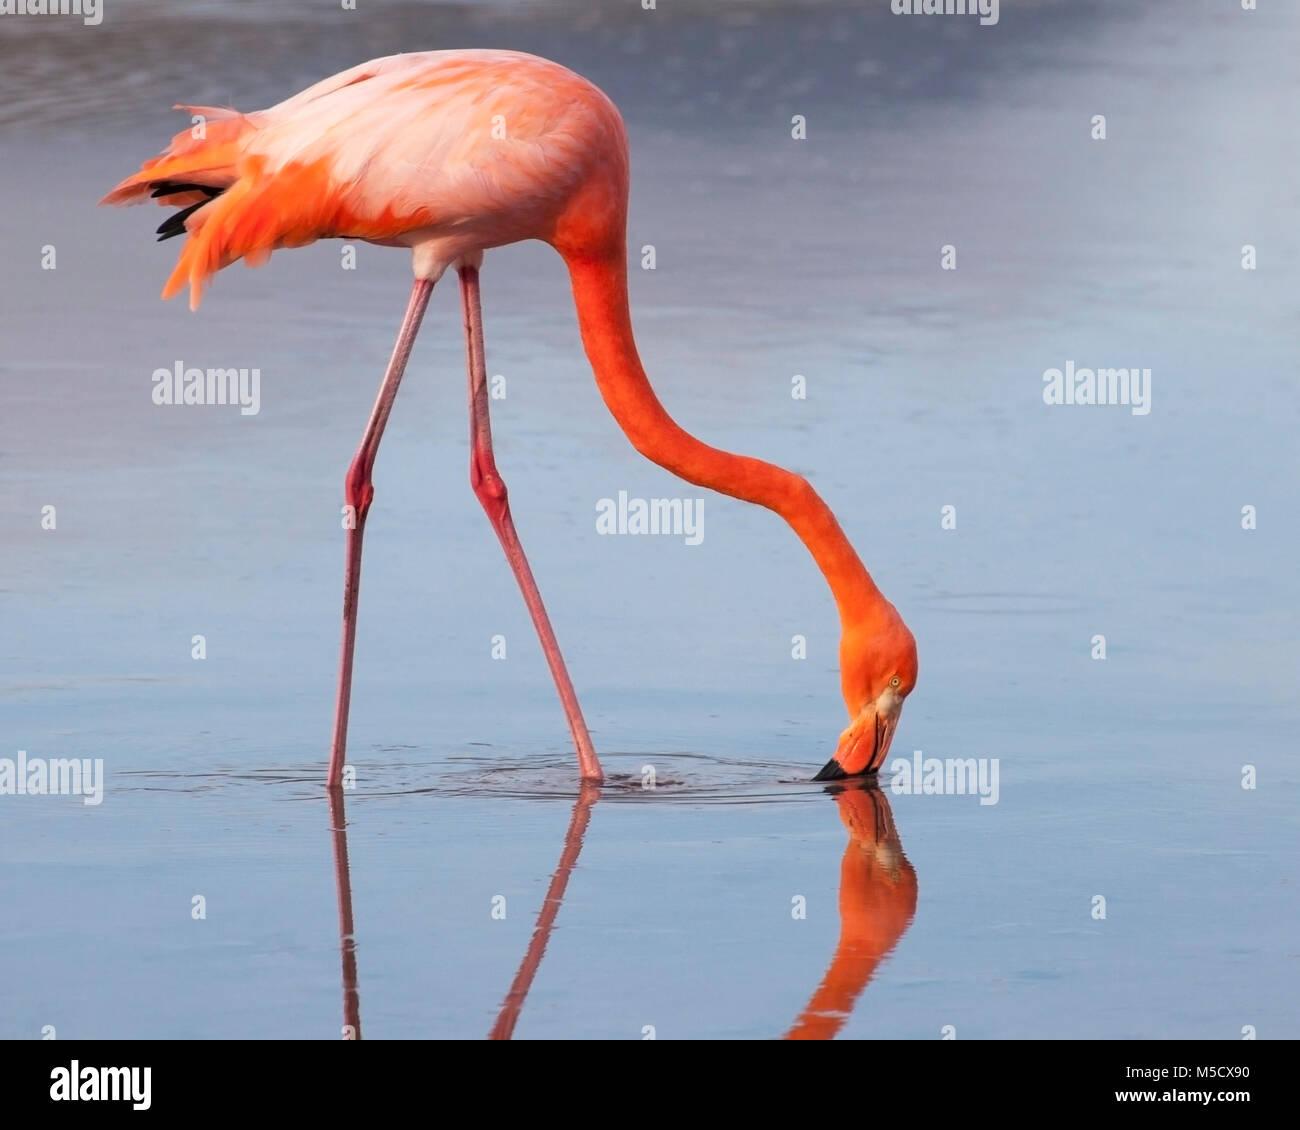 American Flamingo (Phoenicopterus ruber) wading in saline lake - Stock Image